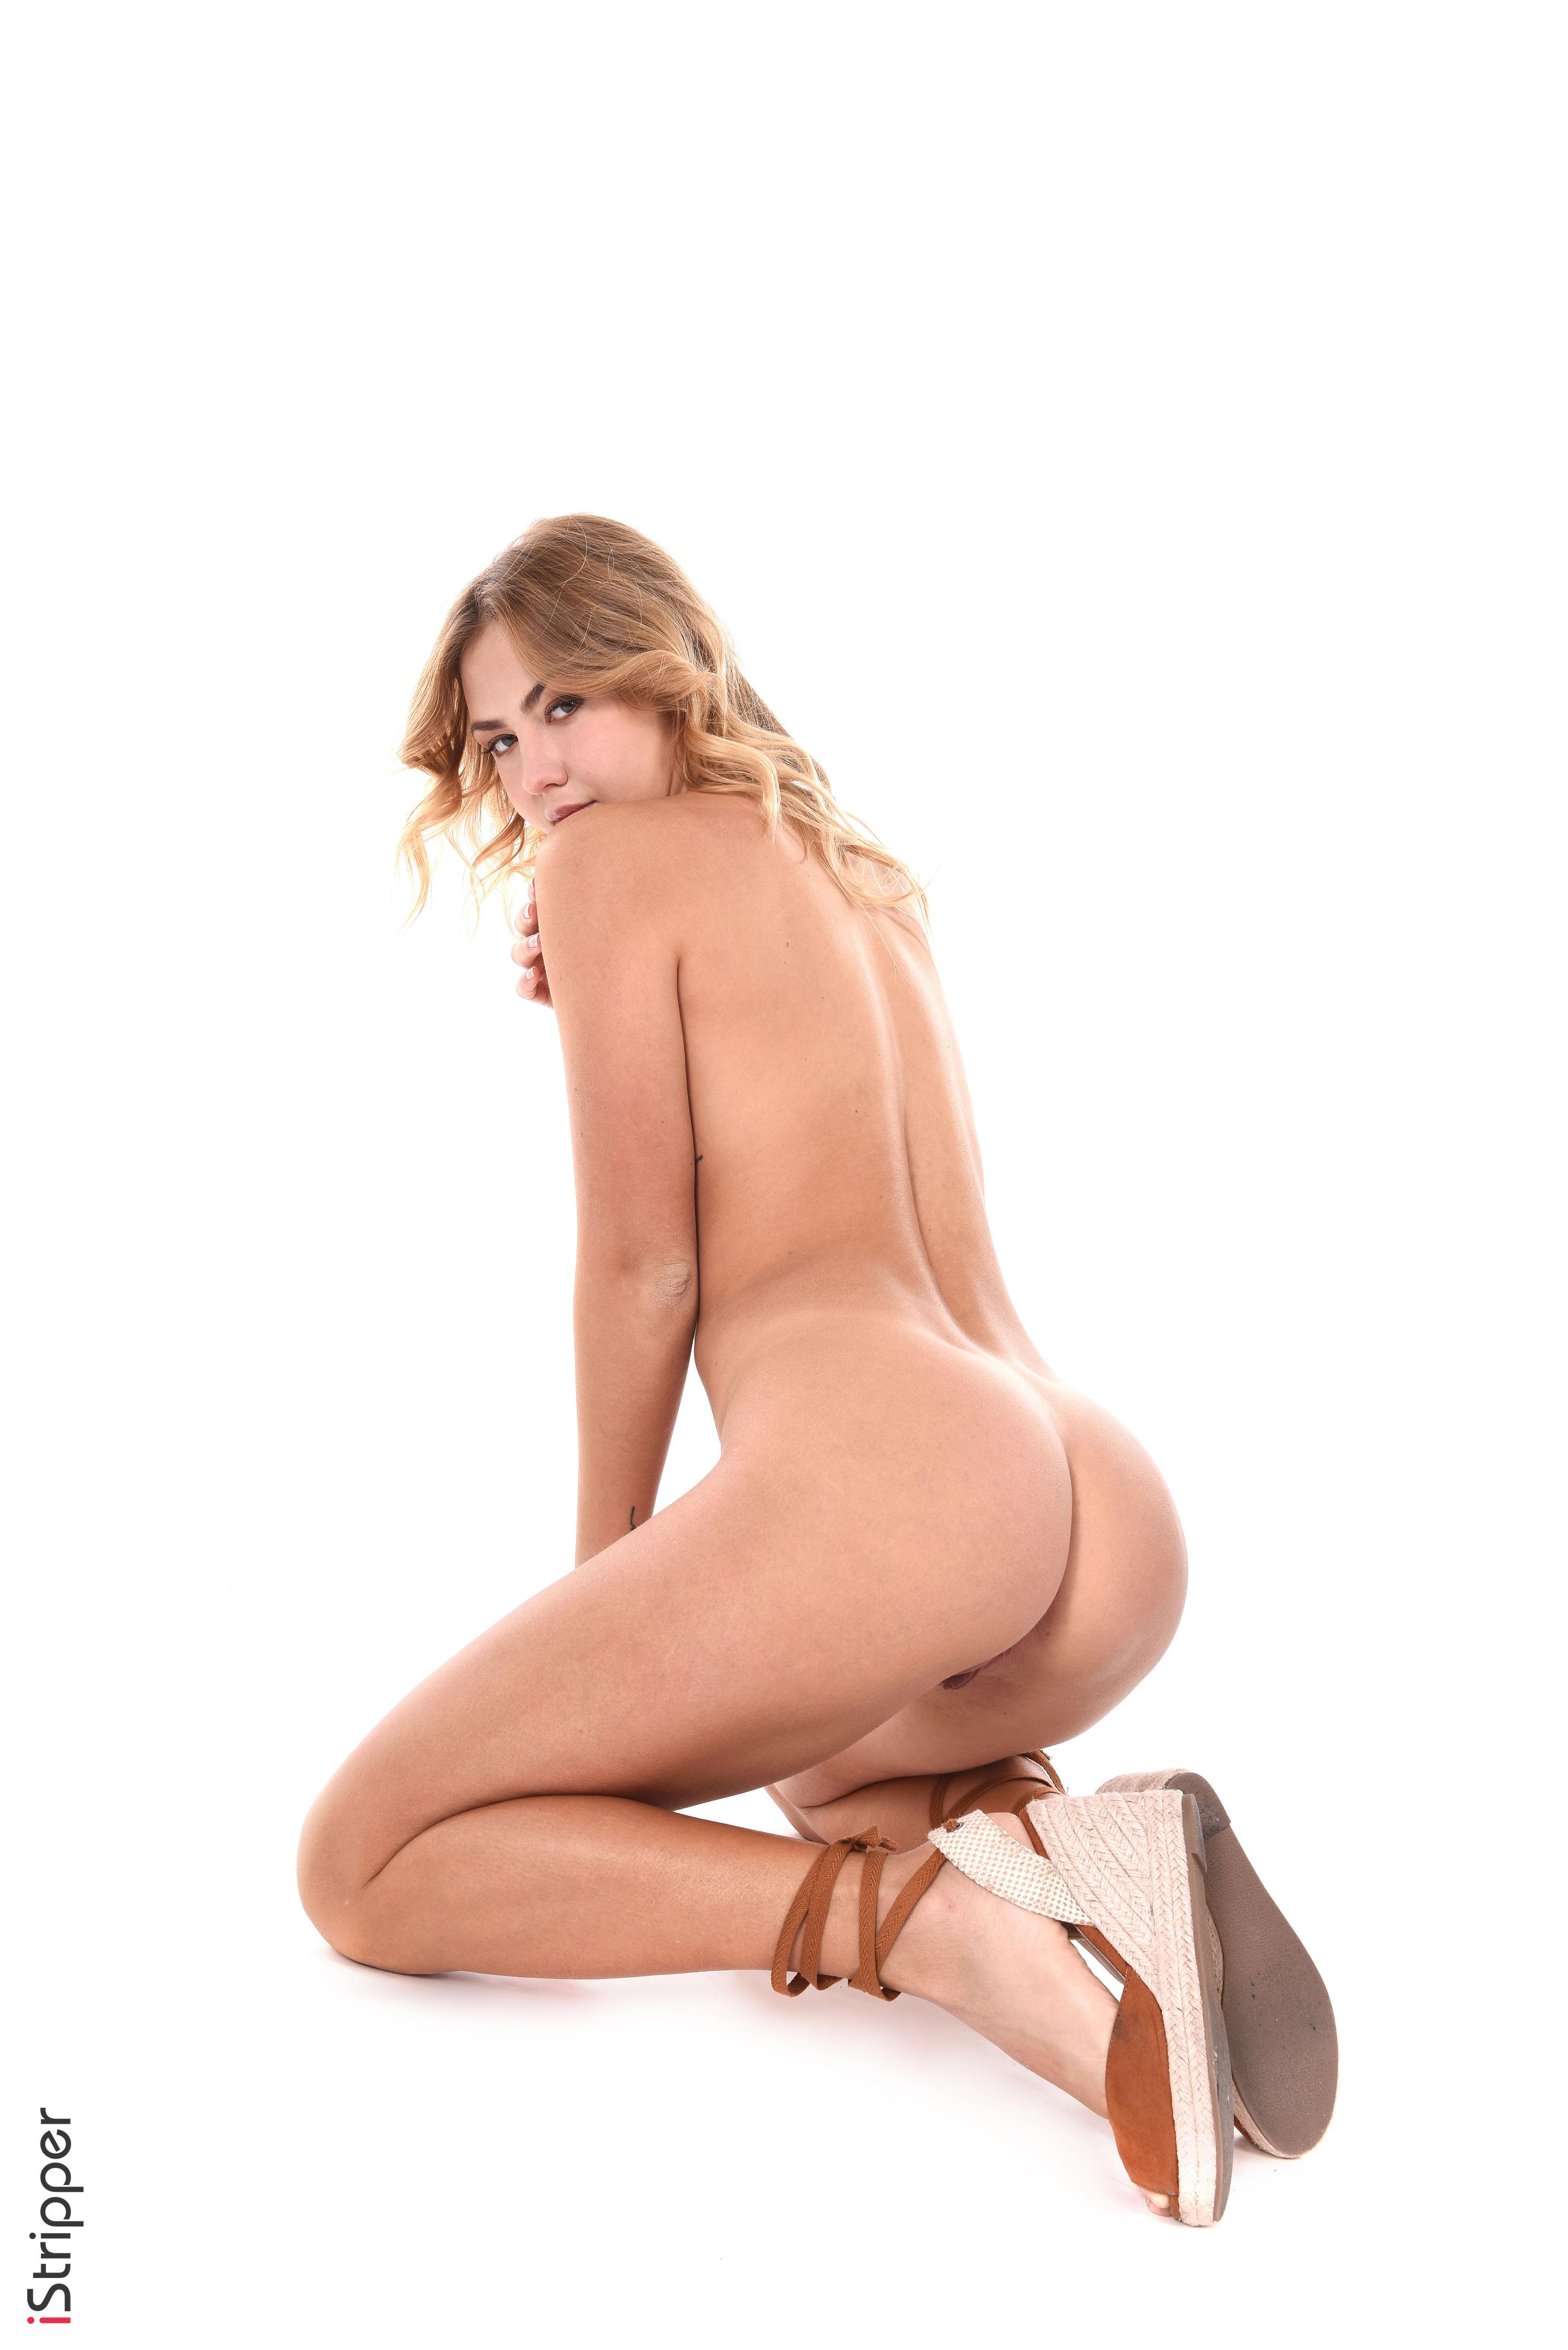 sexy striptease slutload mobile